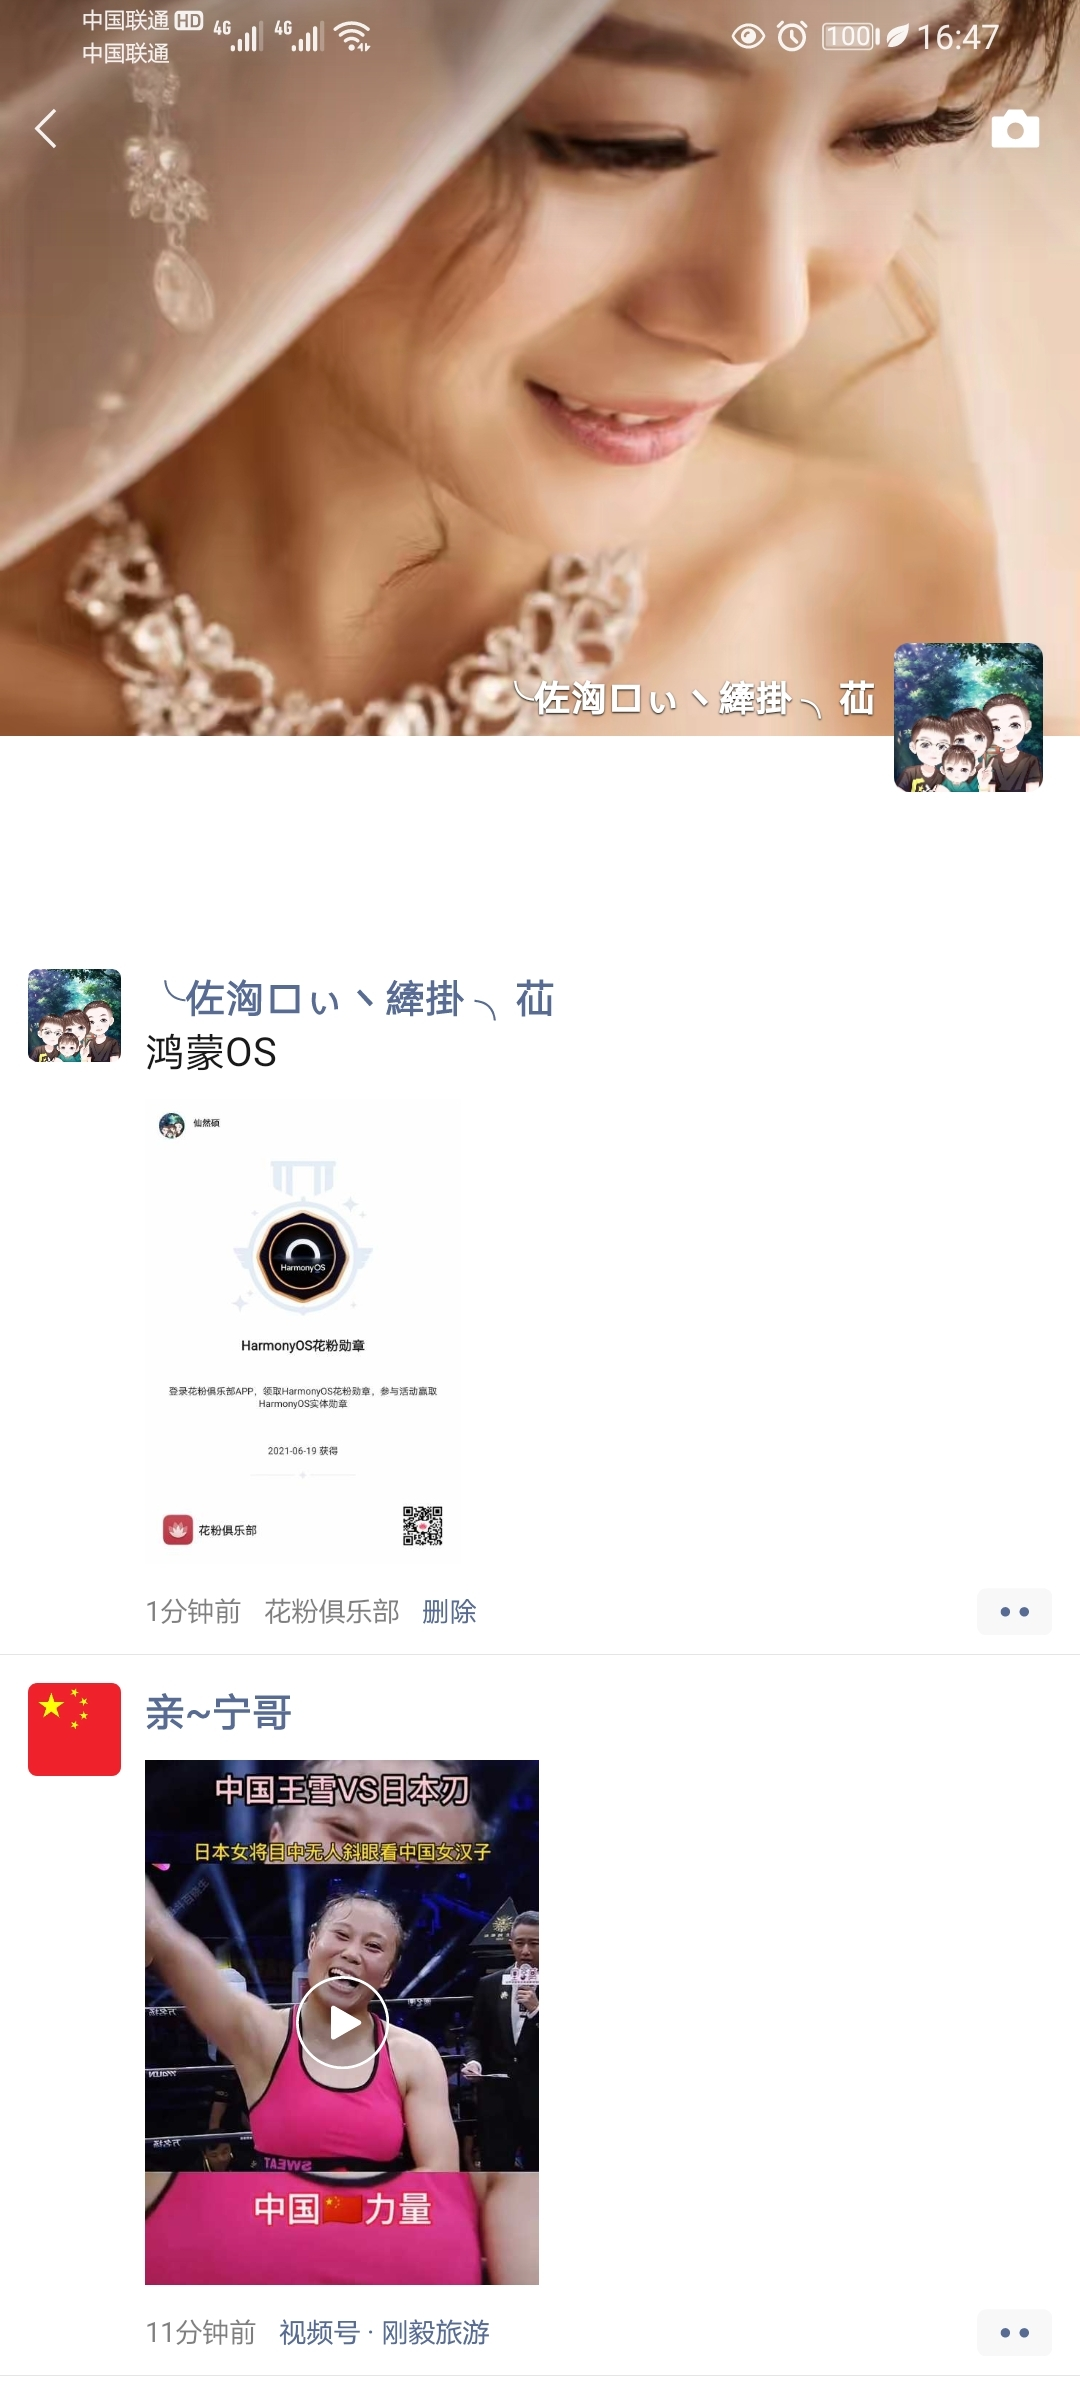 Screenshot_20210802_164753_com.tencent.mm.jpg